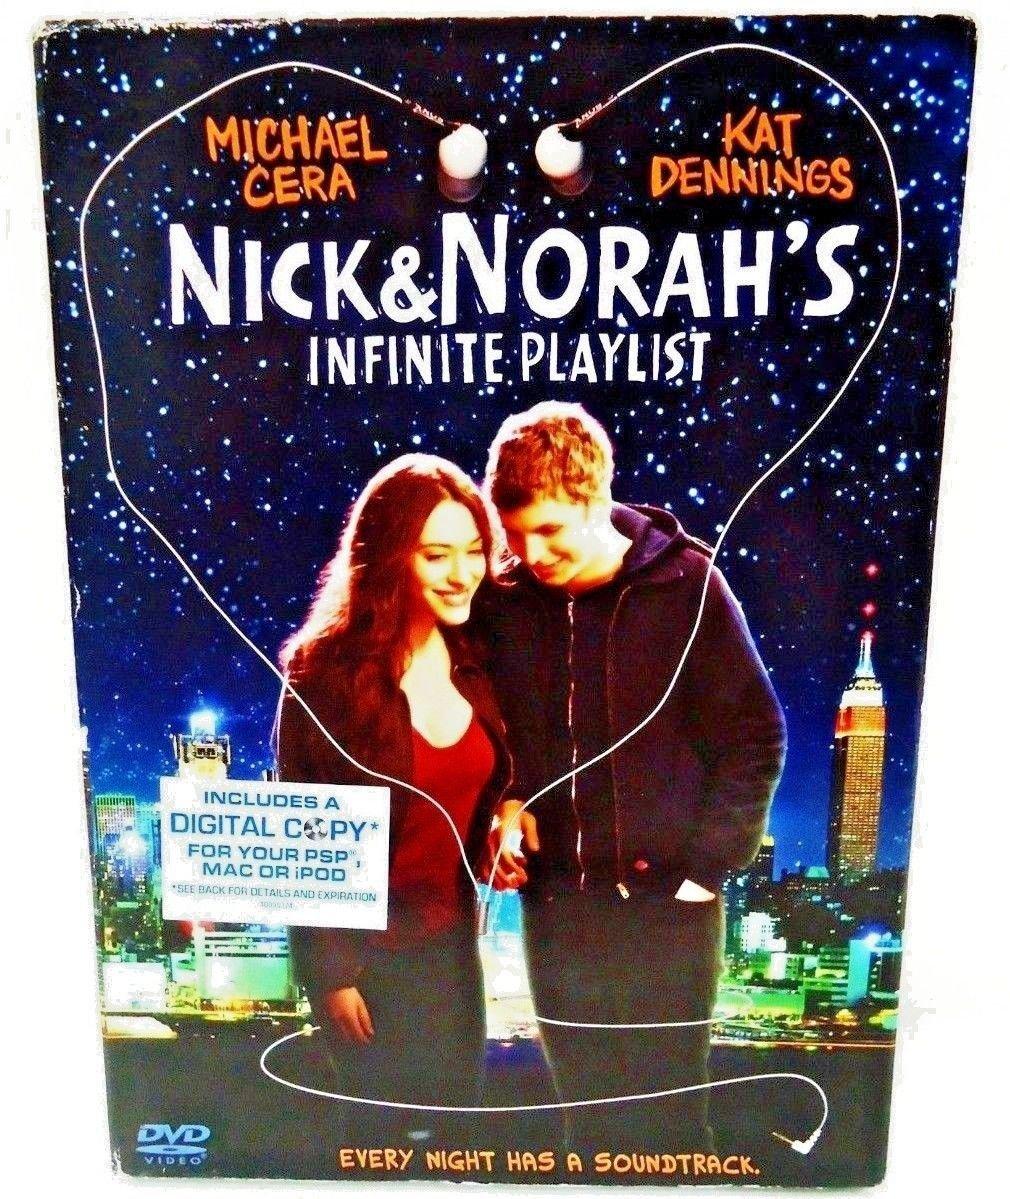 NICK & NORAH'S INFINITE PLAYLIST - DVD - MICHAEL CERA - NEW - COMEDY - MOVIE